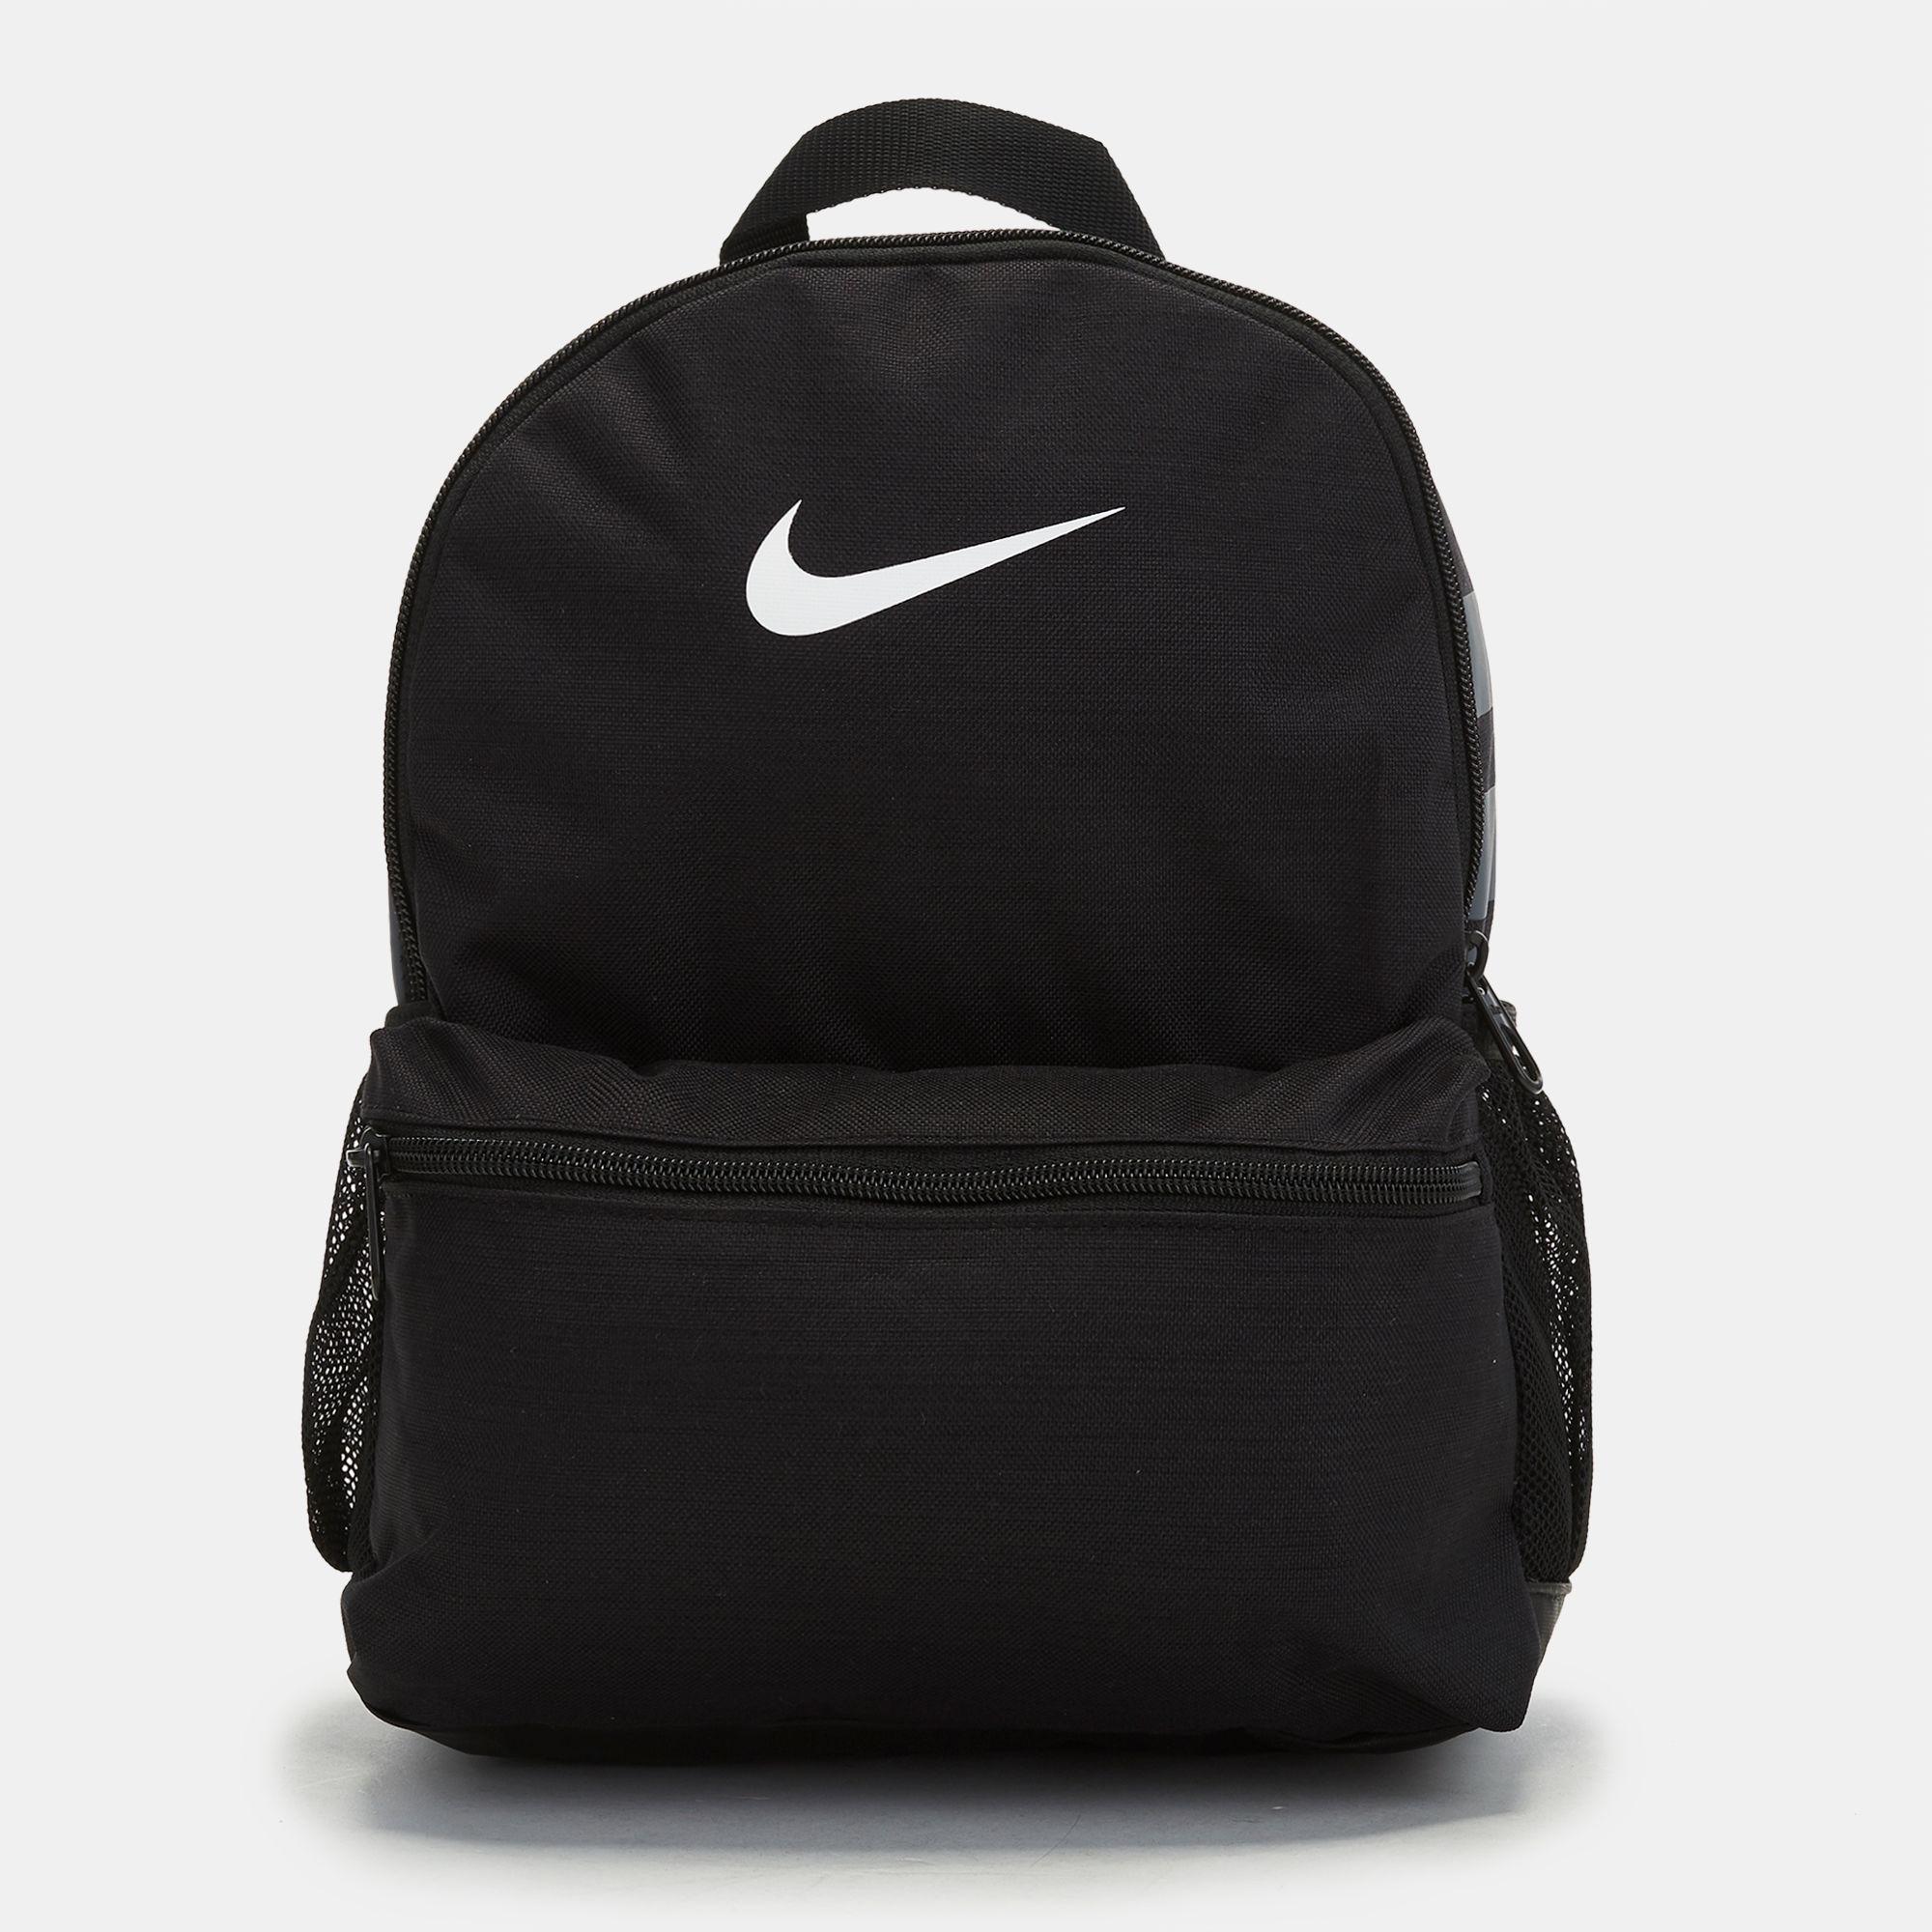 6b2370fb47 Nike Kids  Brasilia Just Do It Backpack (Mini) (Older Kids) -